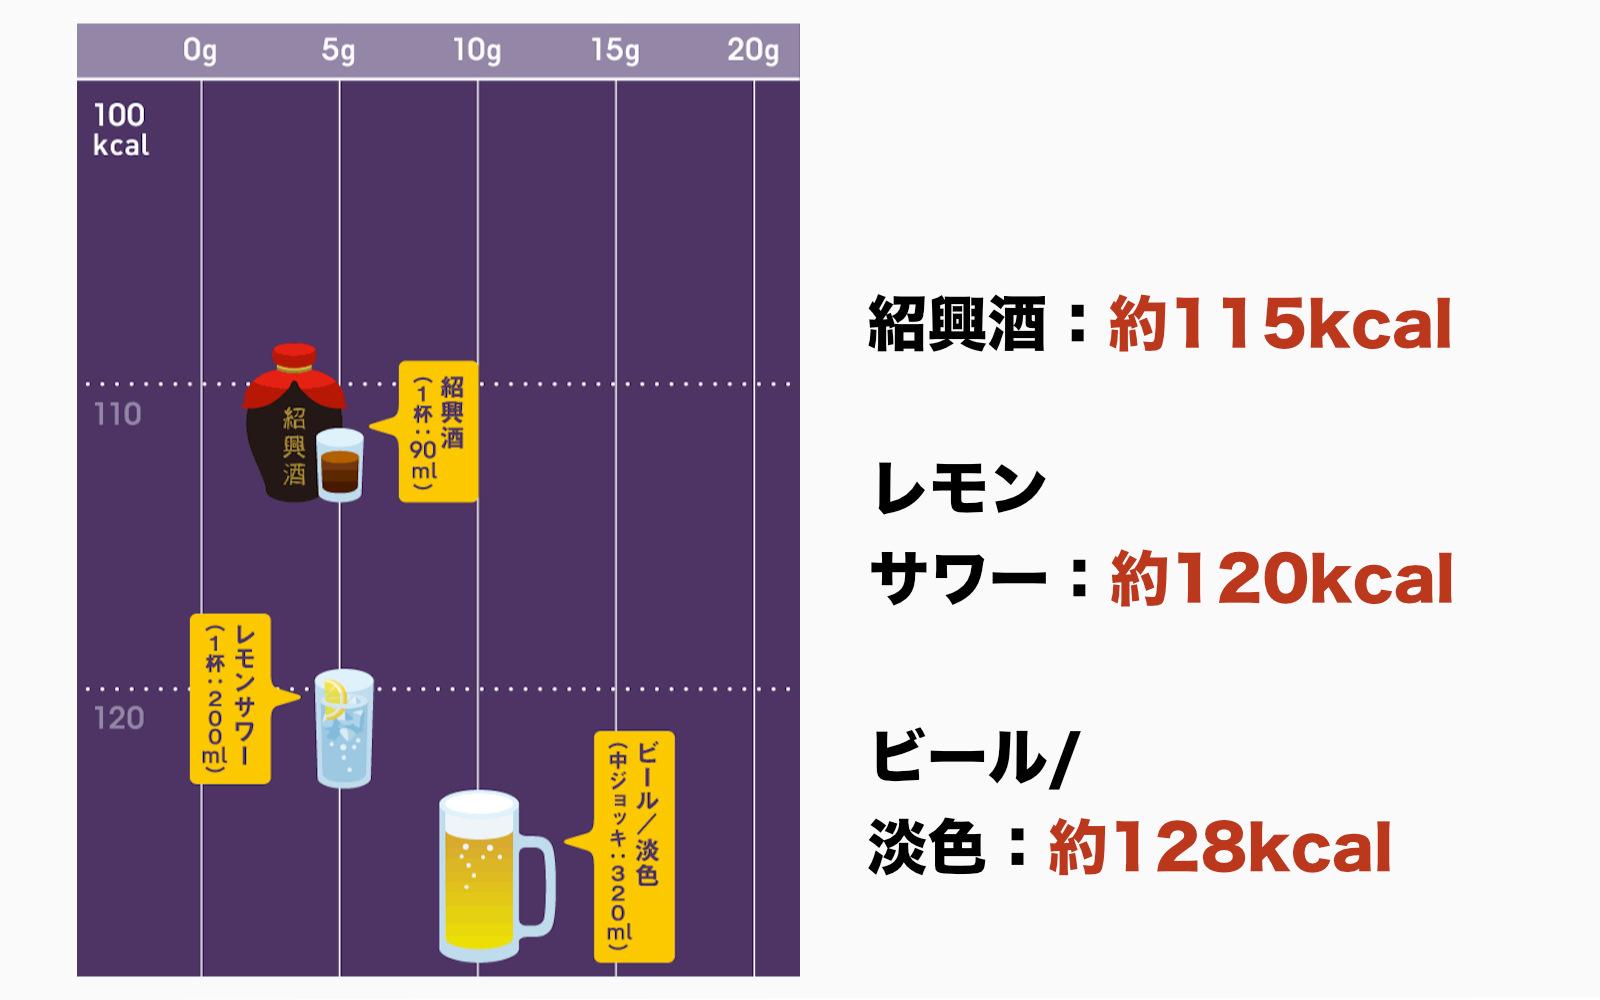 alcohol-calories-ranking-03